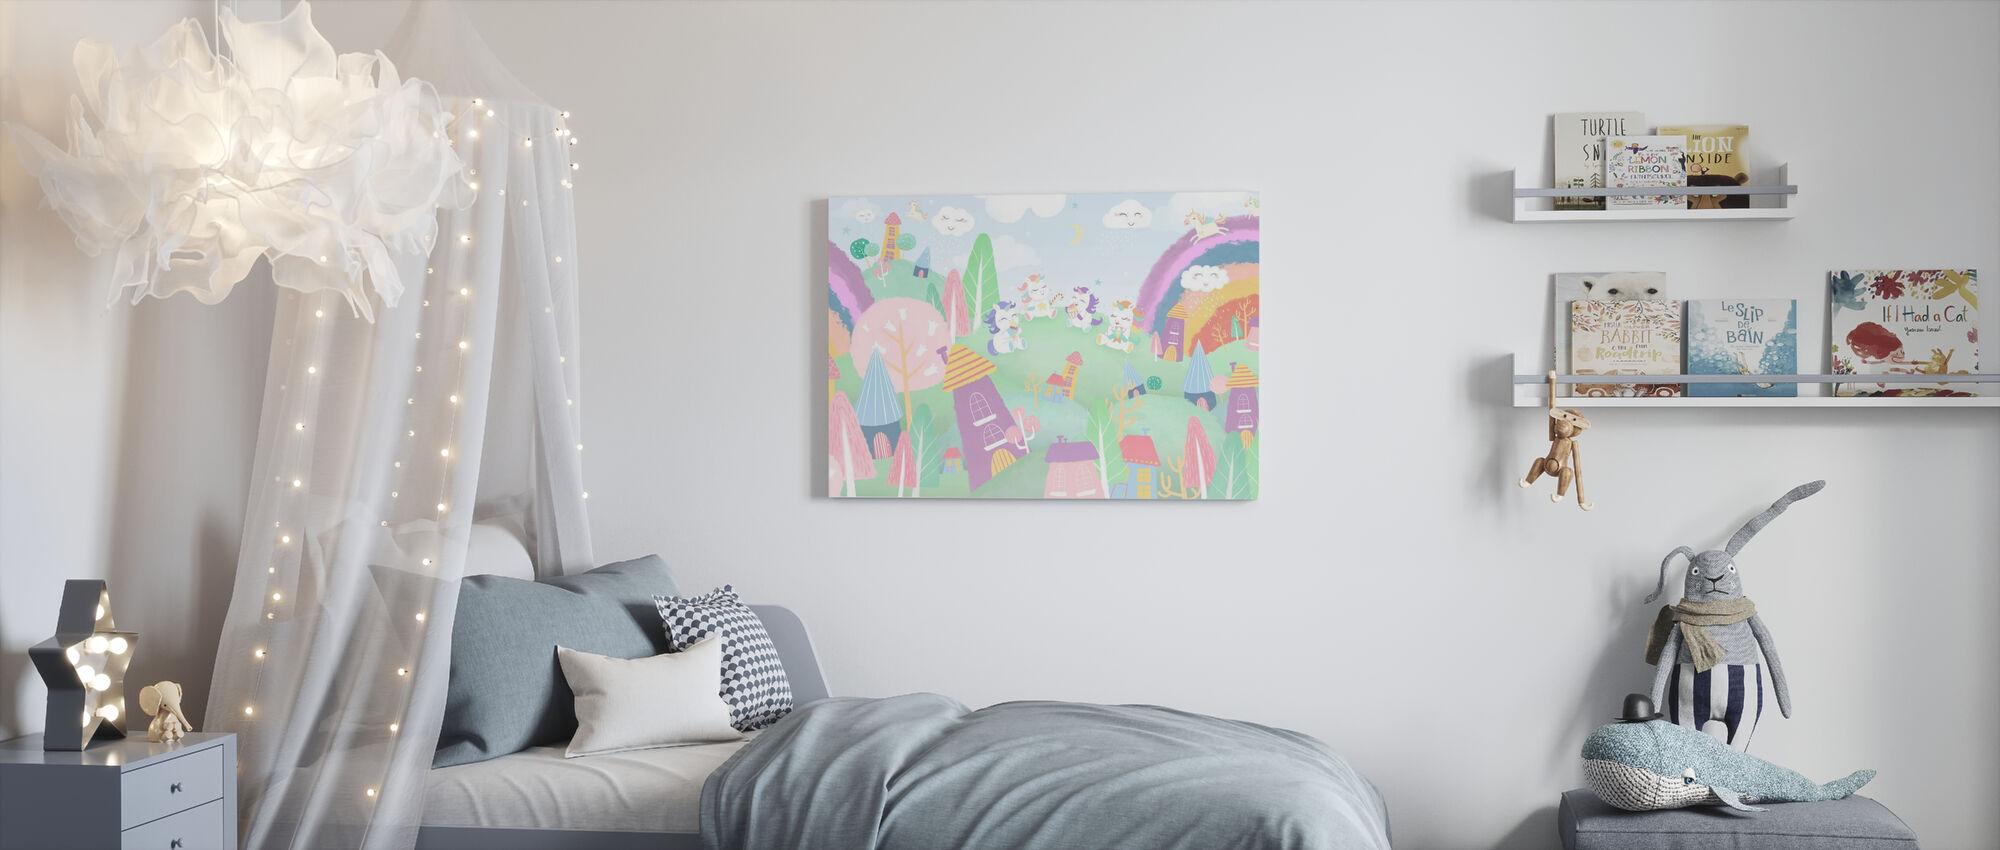 Unicorn Village - Canvas print - Kids Room